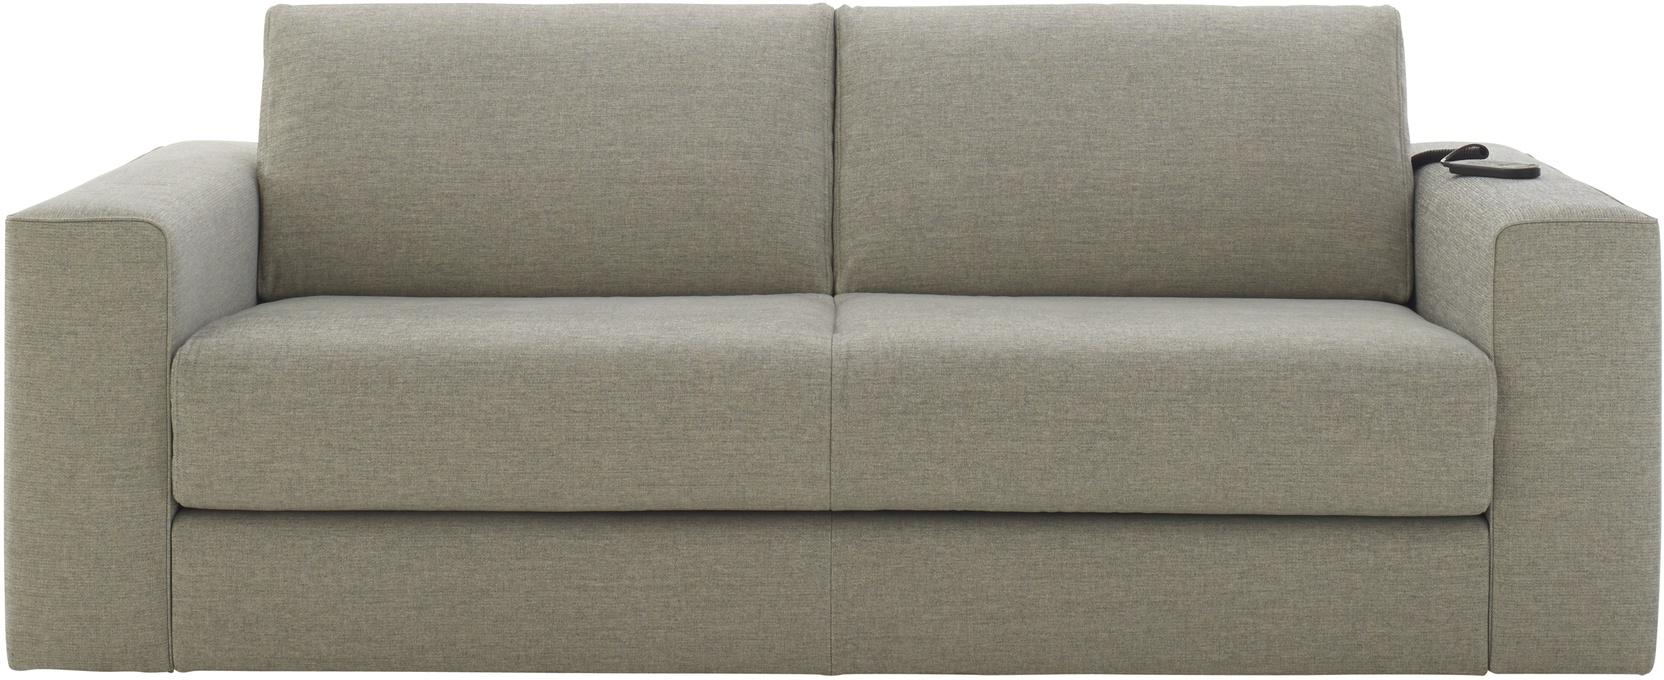 Schlafsofa trkis trendy latest living room sofa design for Schlafsofa 1 40x2 00